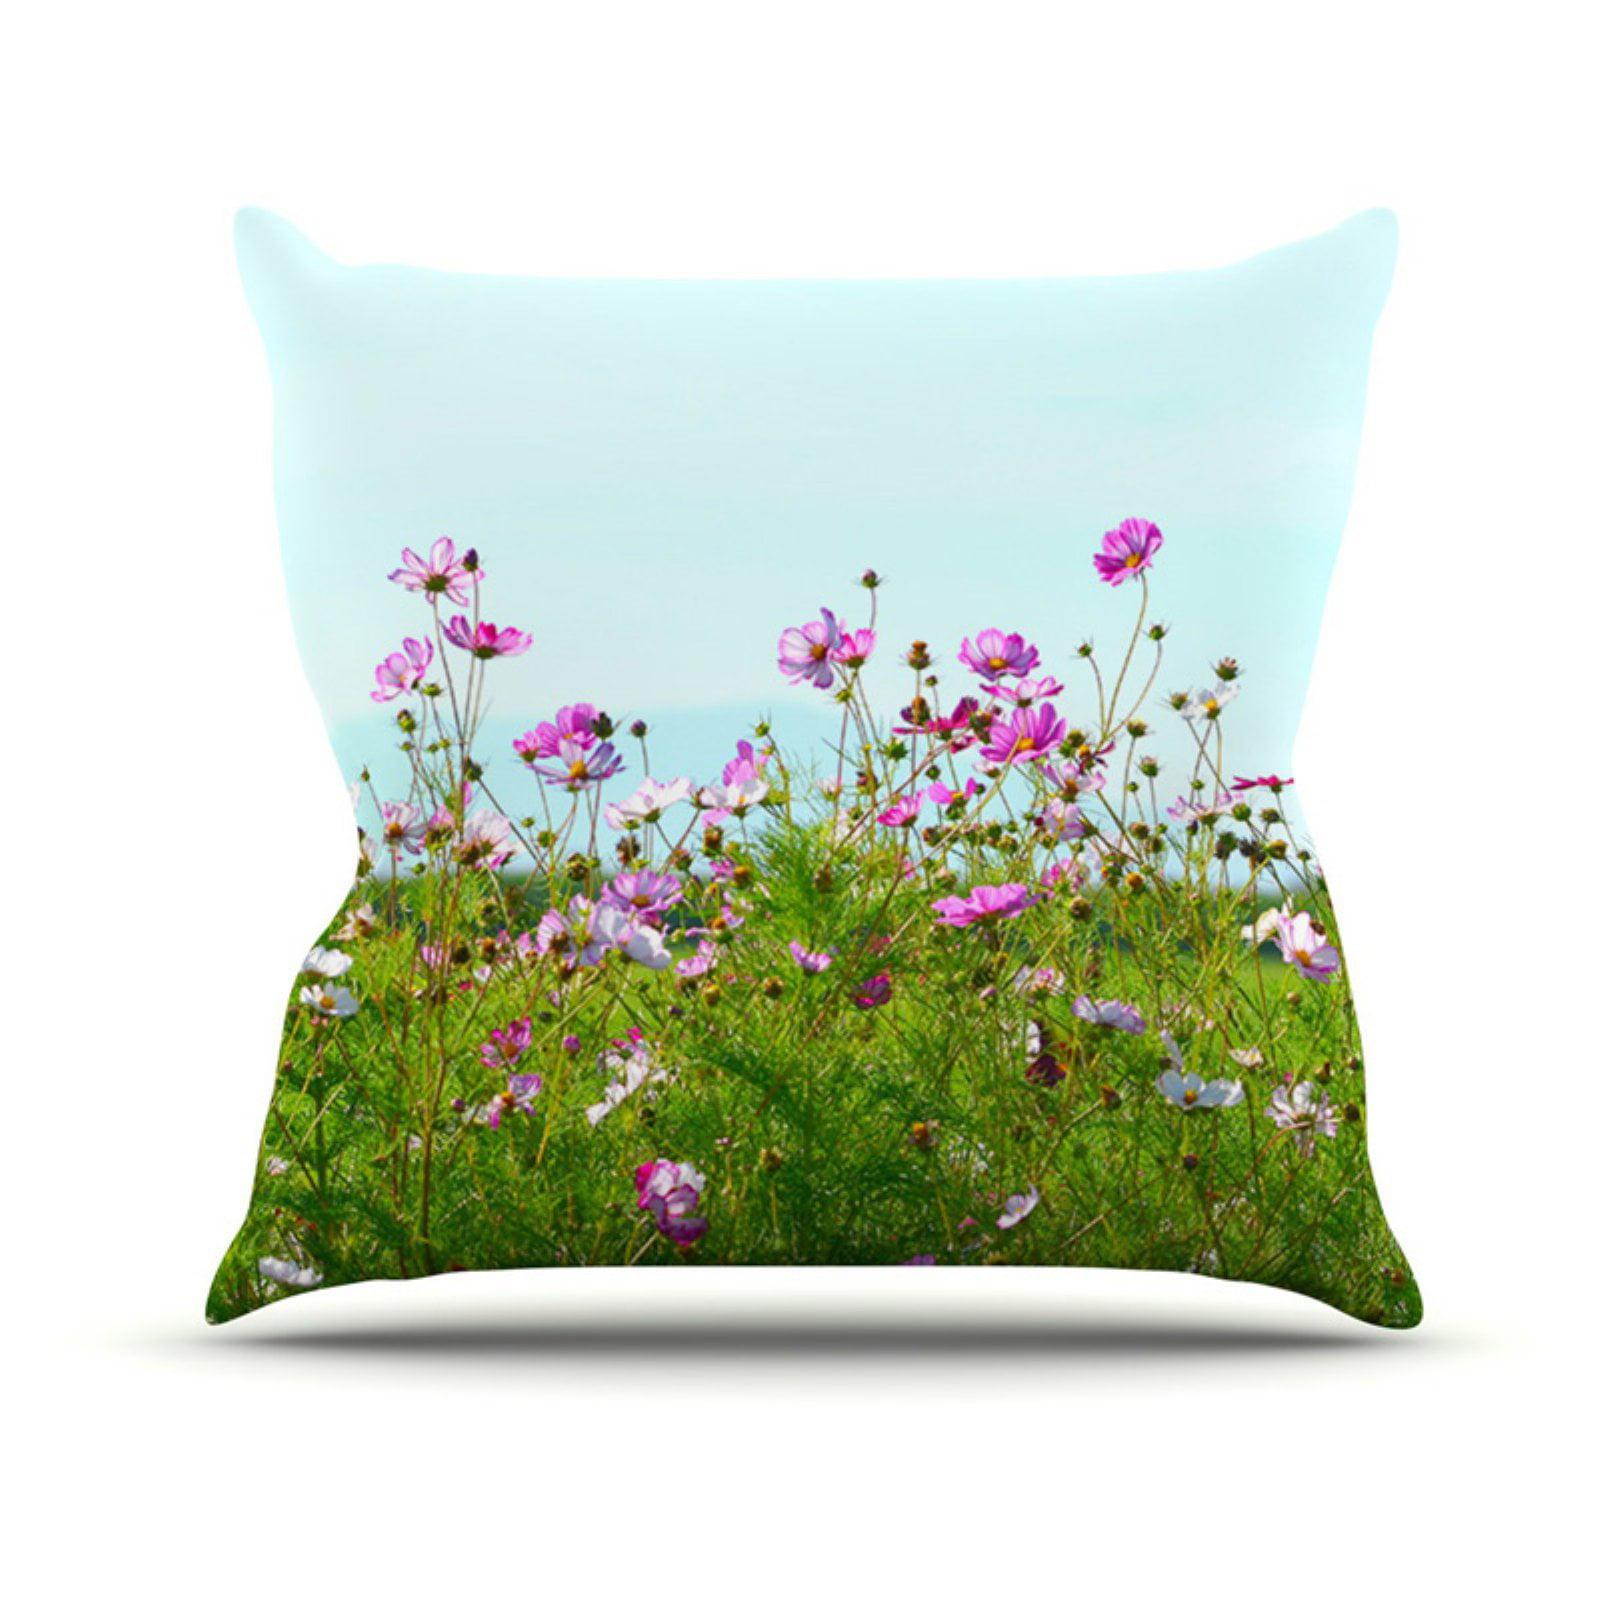 Kess InHouse Robin Dickinson I Choose Magic Flowers Indoor/Outdoor Throw Pillow